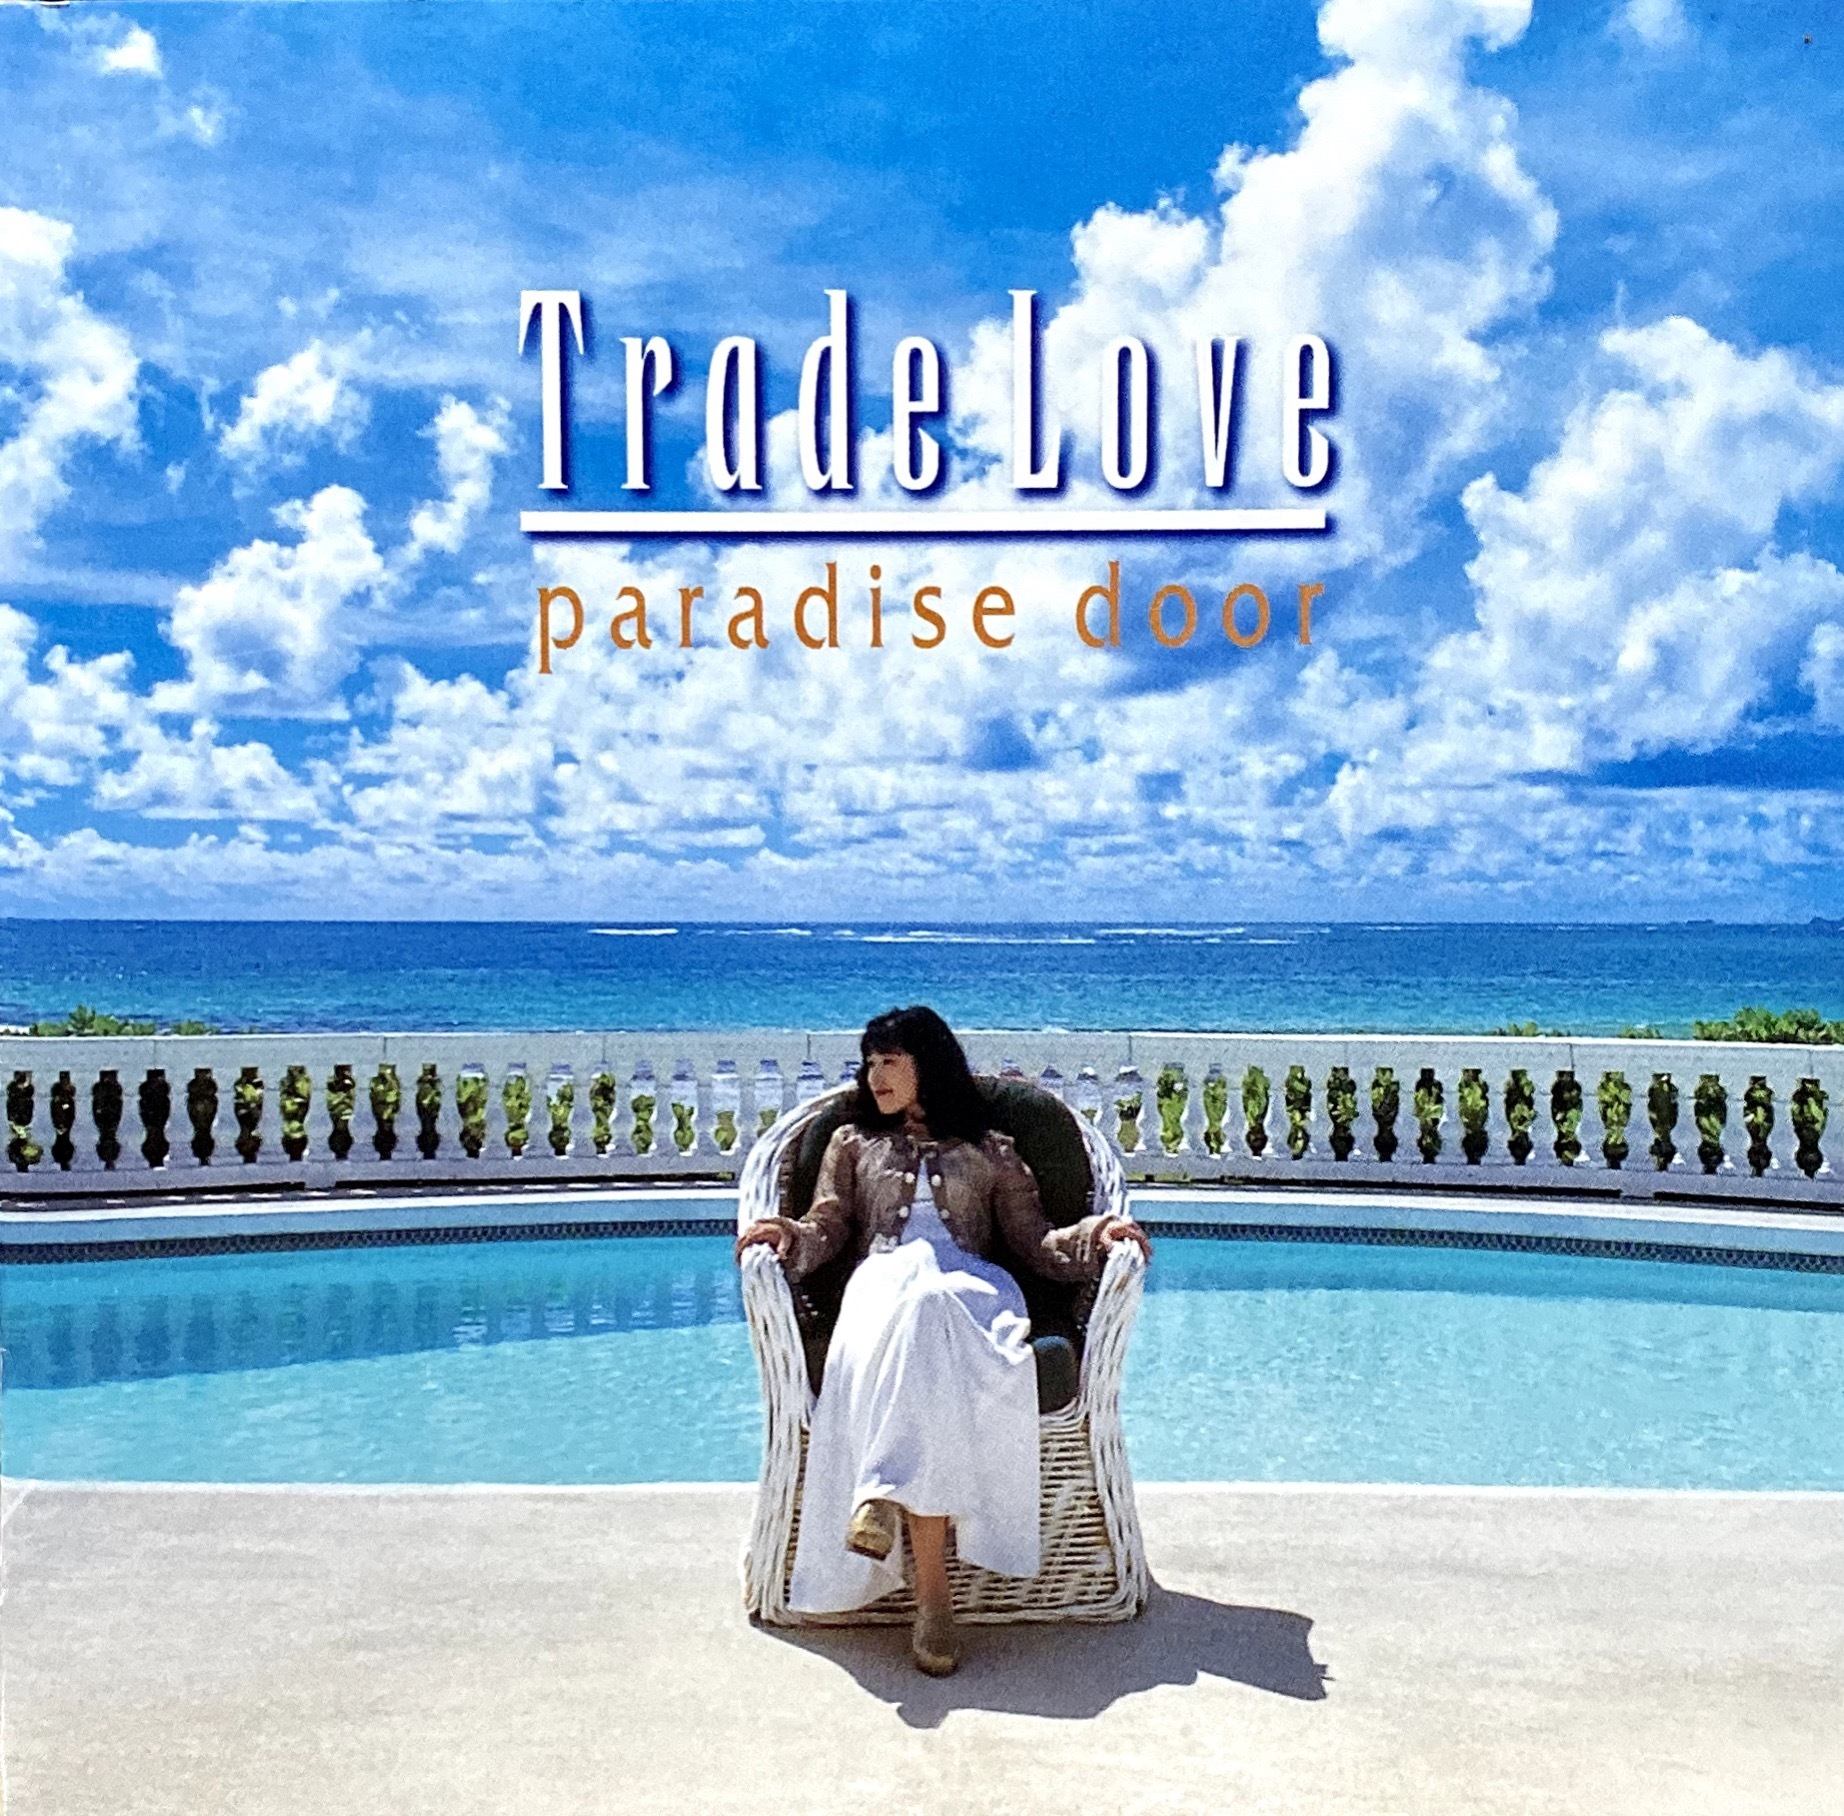 7Trade Love